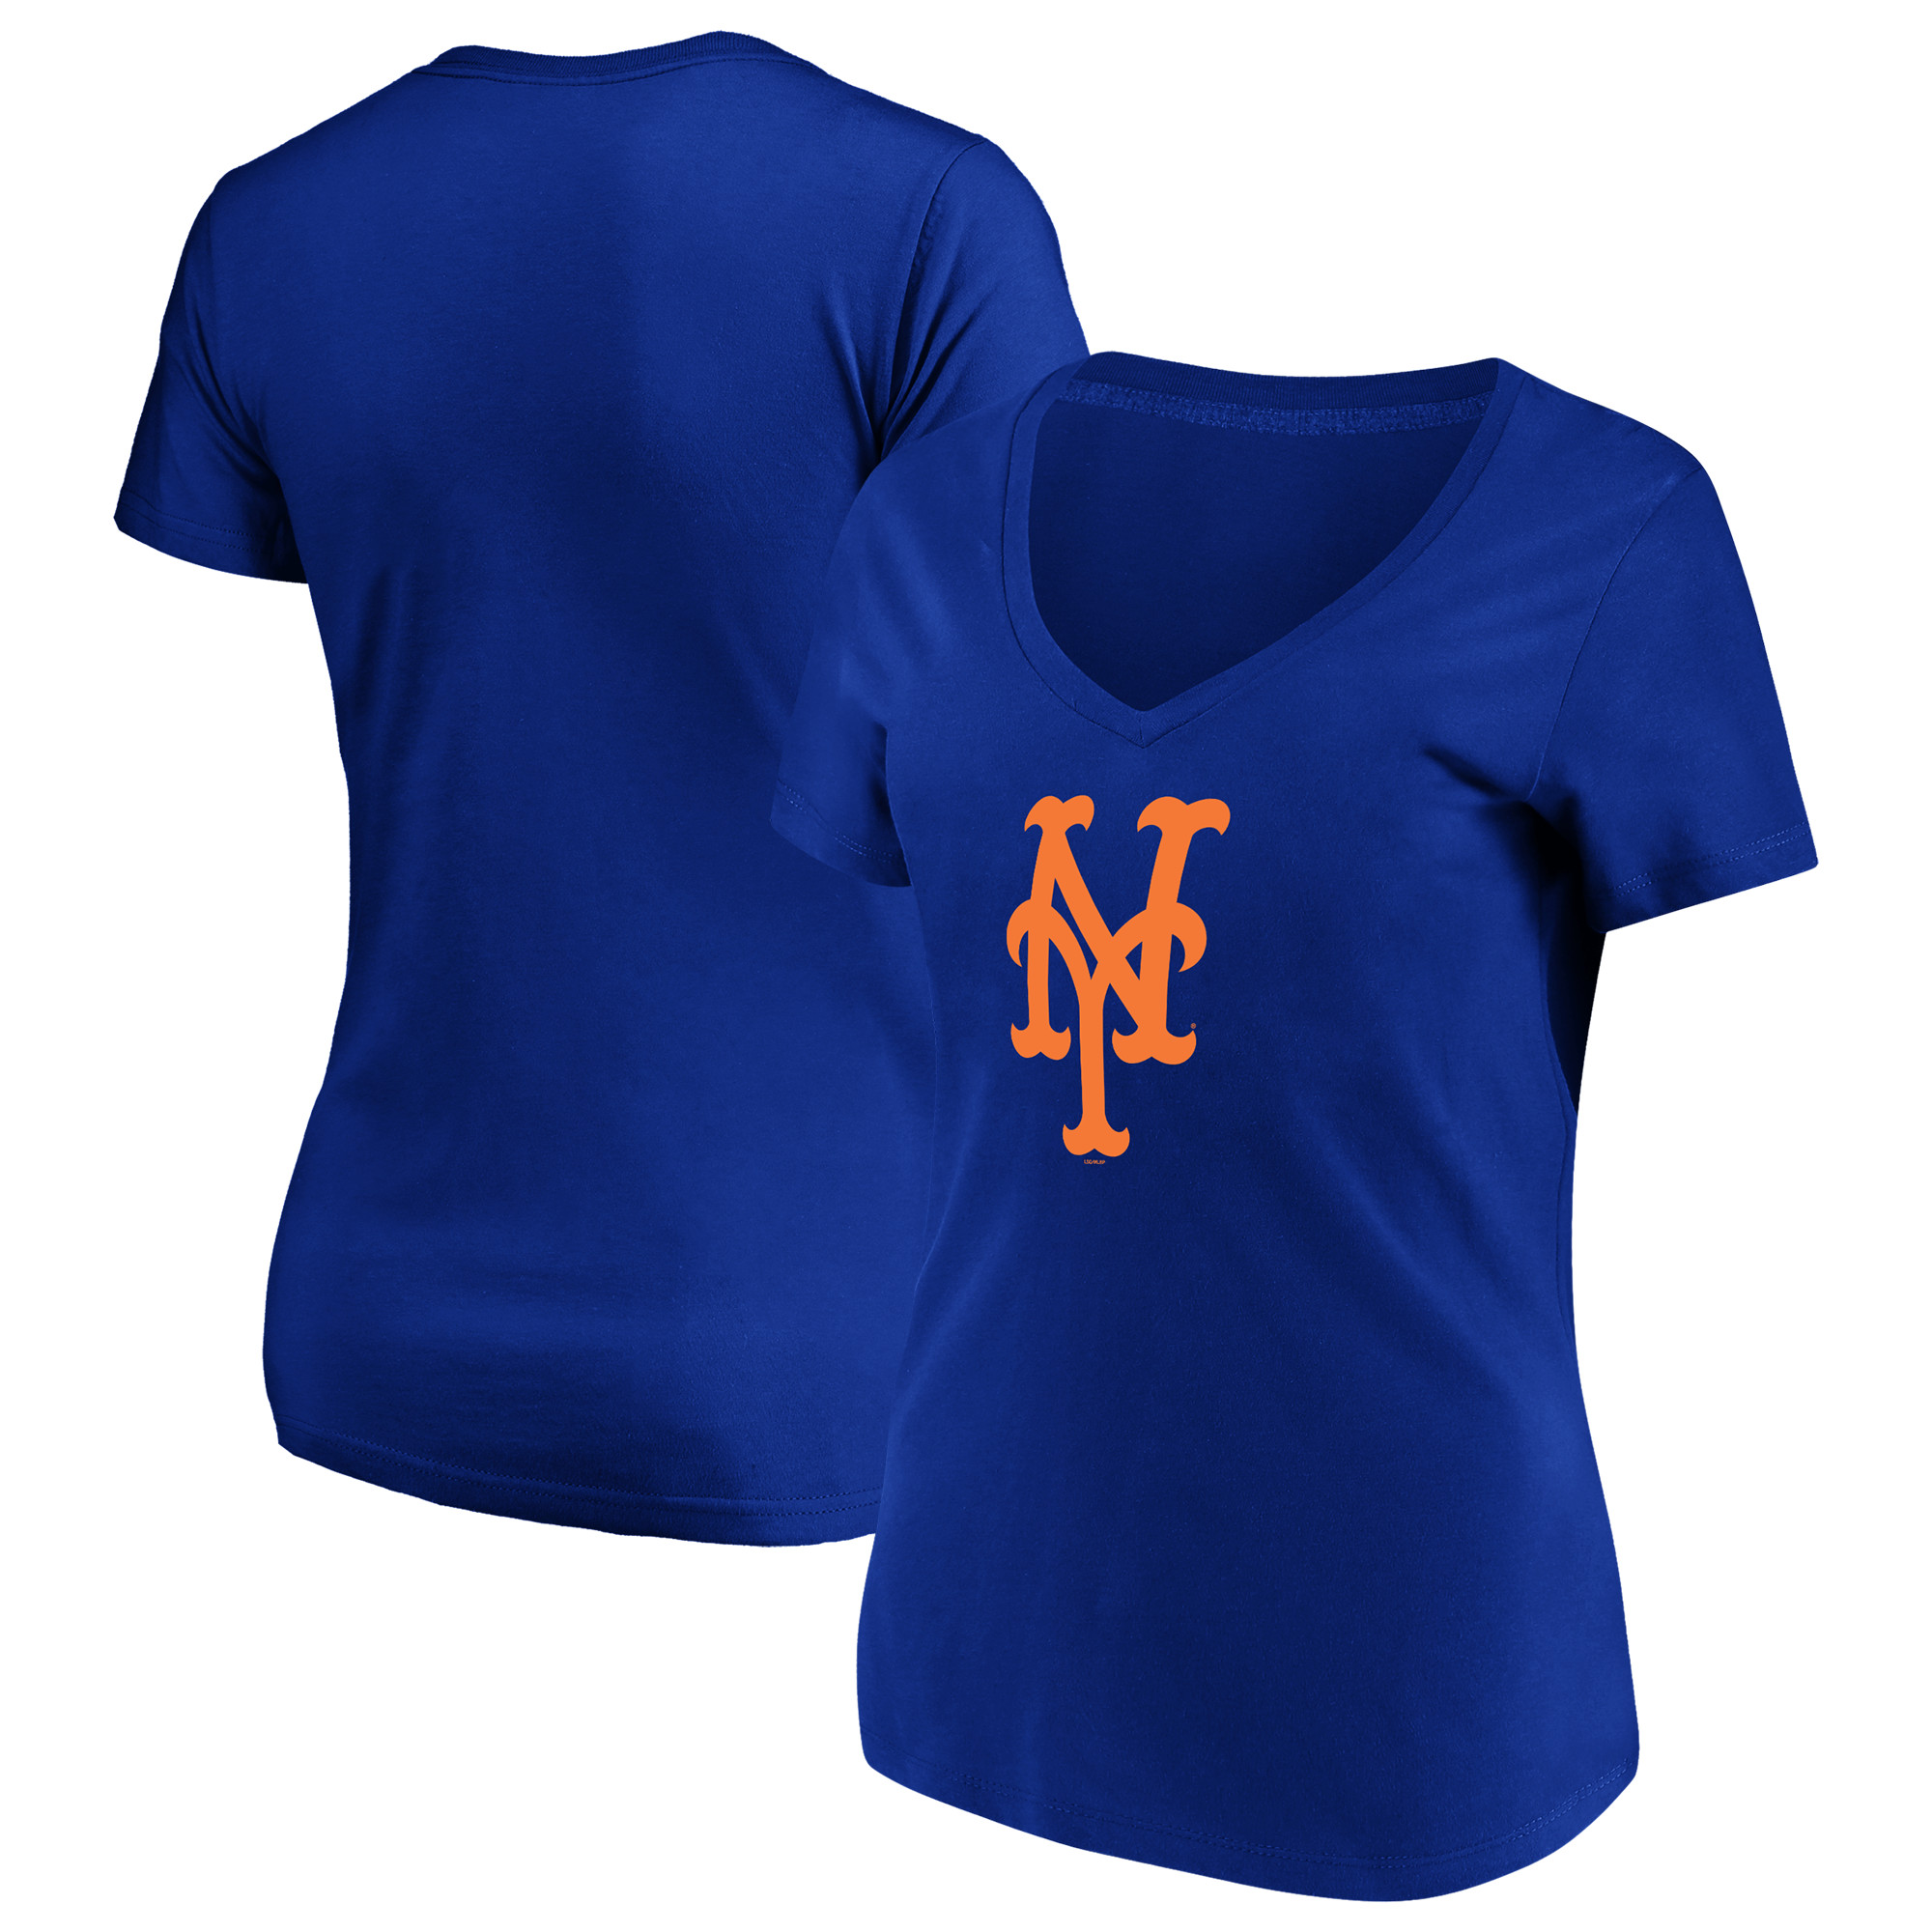 Women's Majestic Royal New York Mets Top Ranking V-Neck T-Shirt